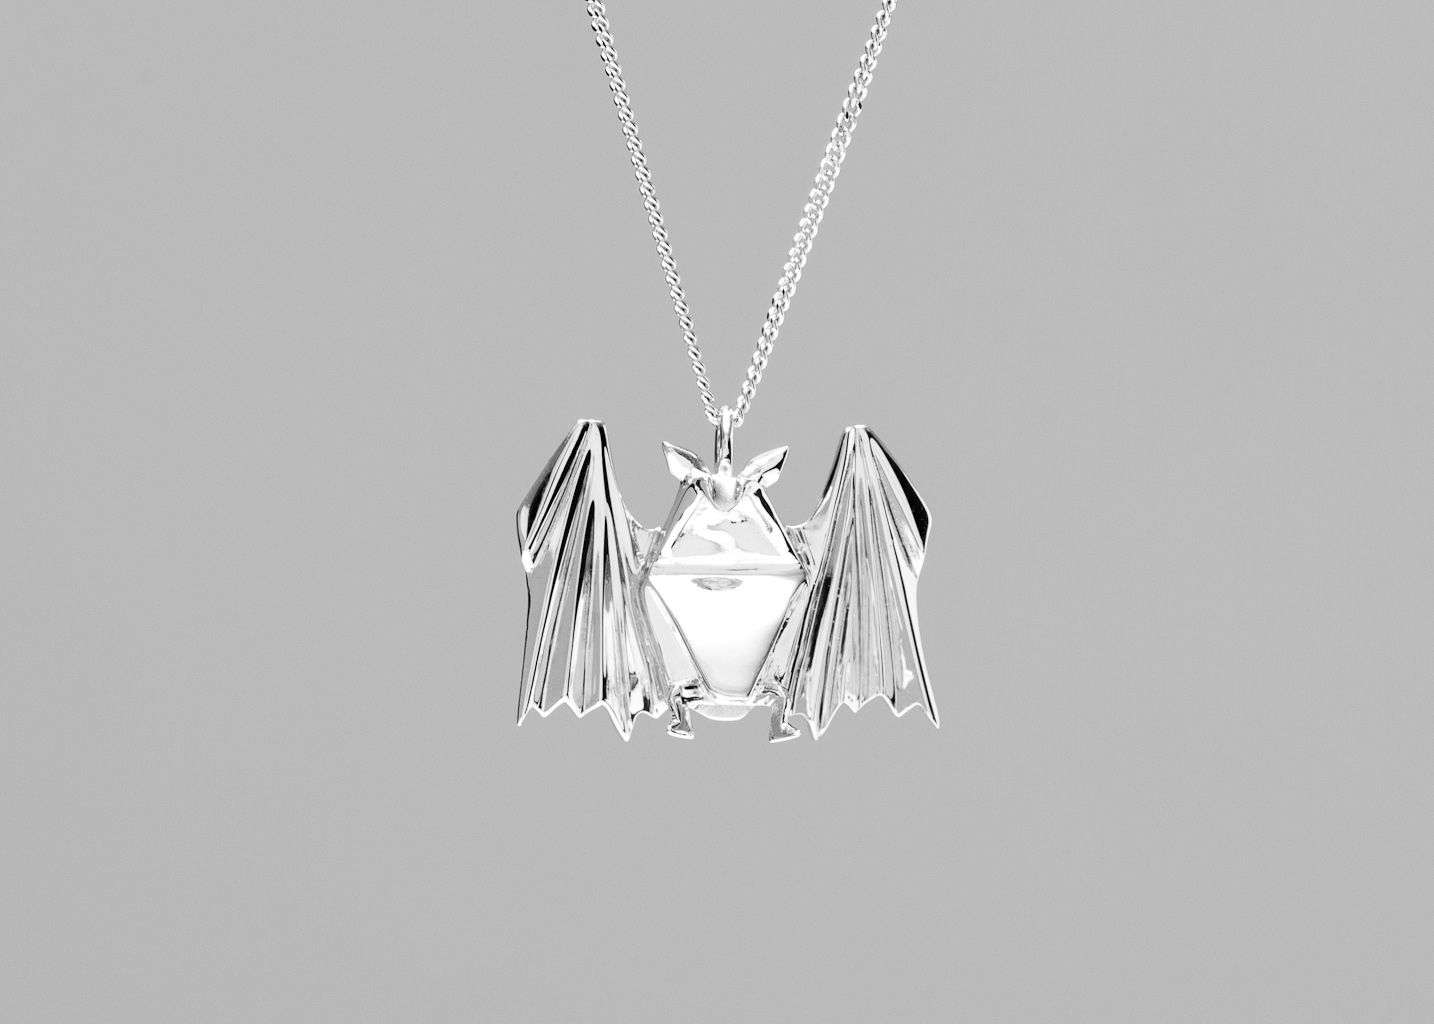 Sautoir Chauve-Souris - Origami Jewellery